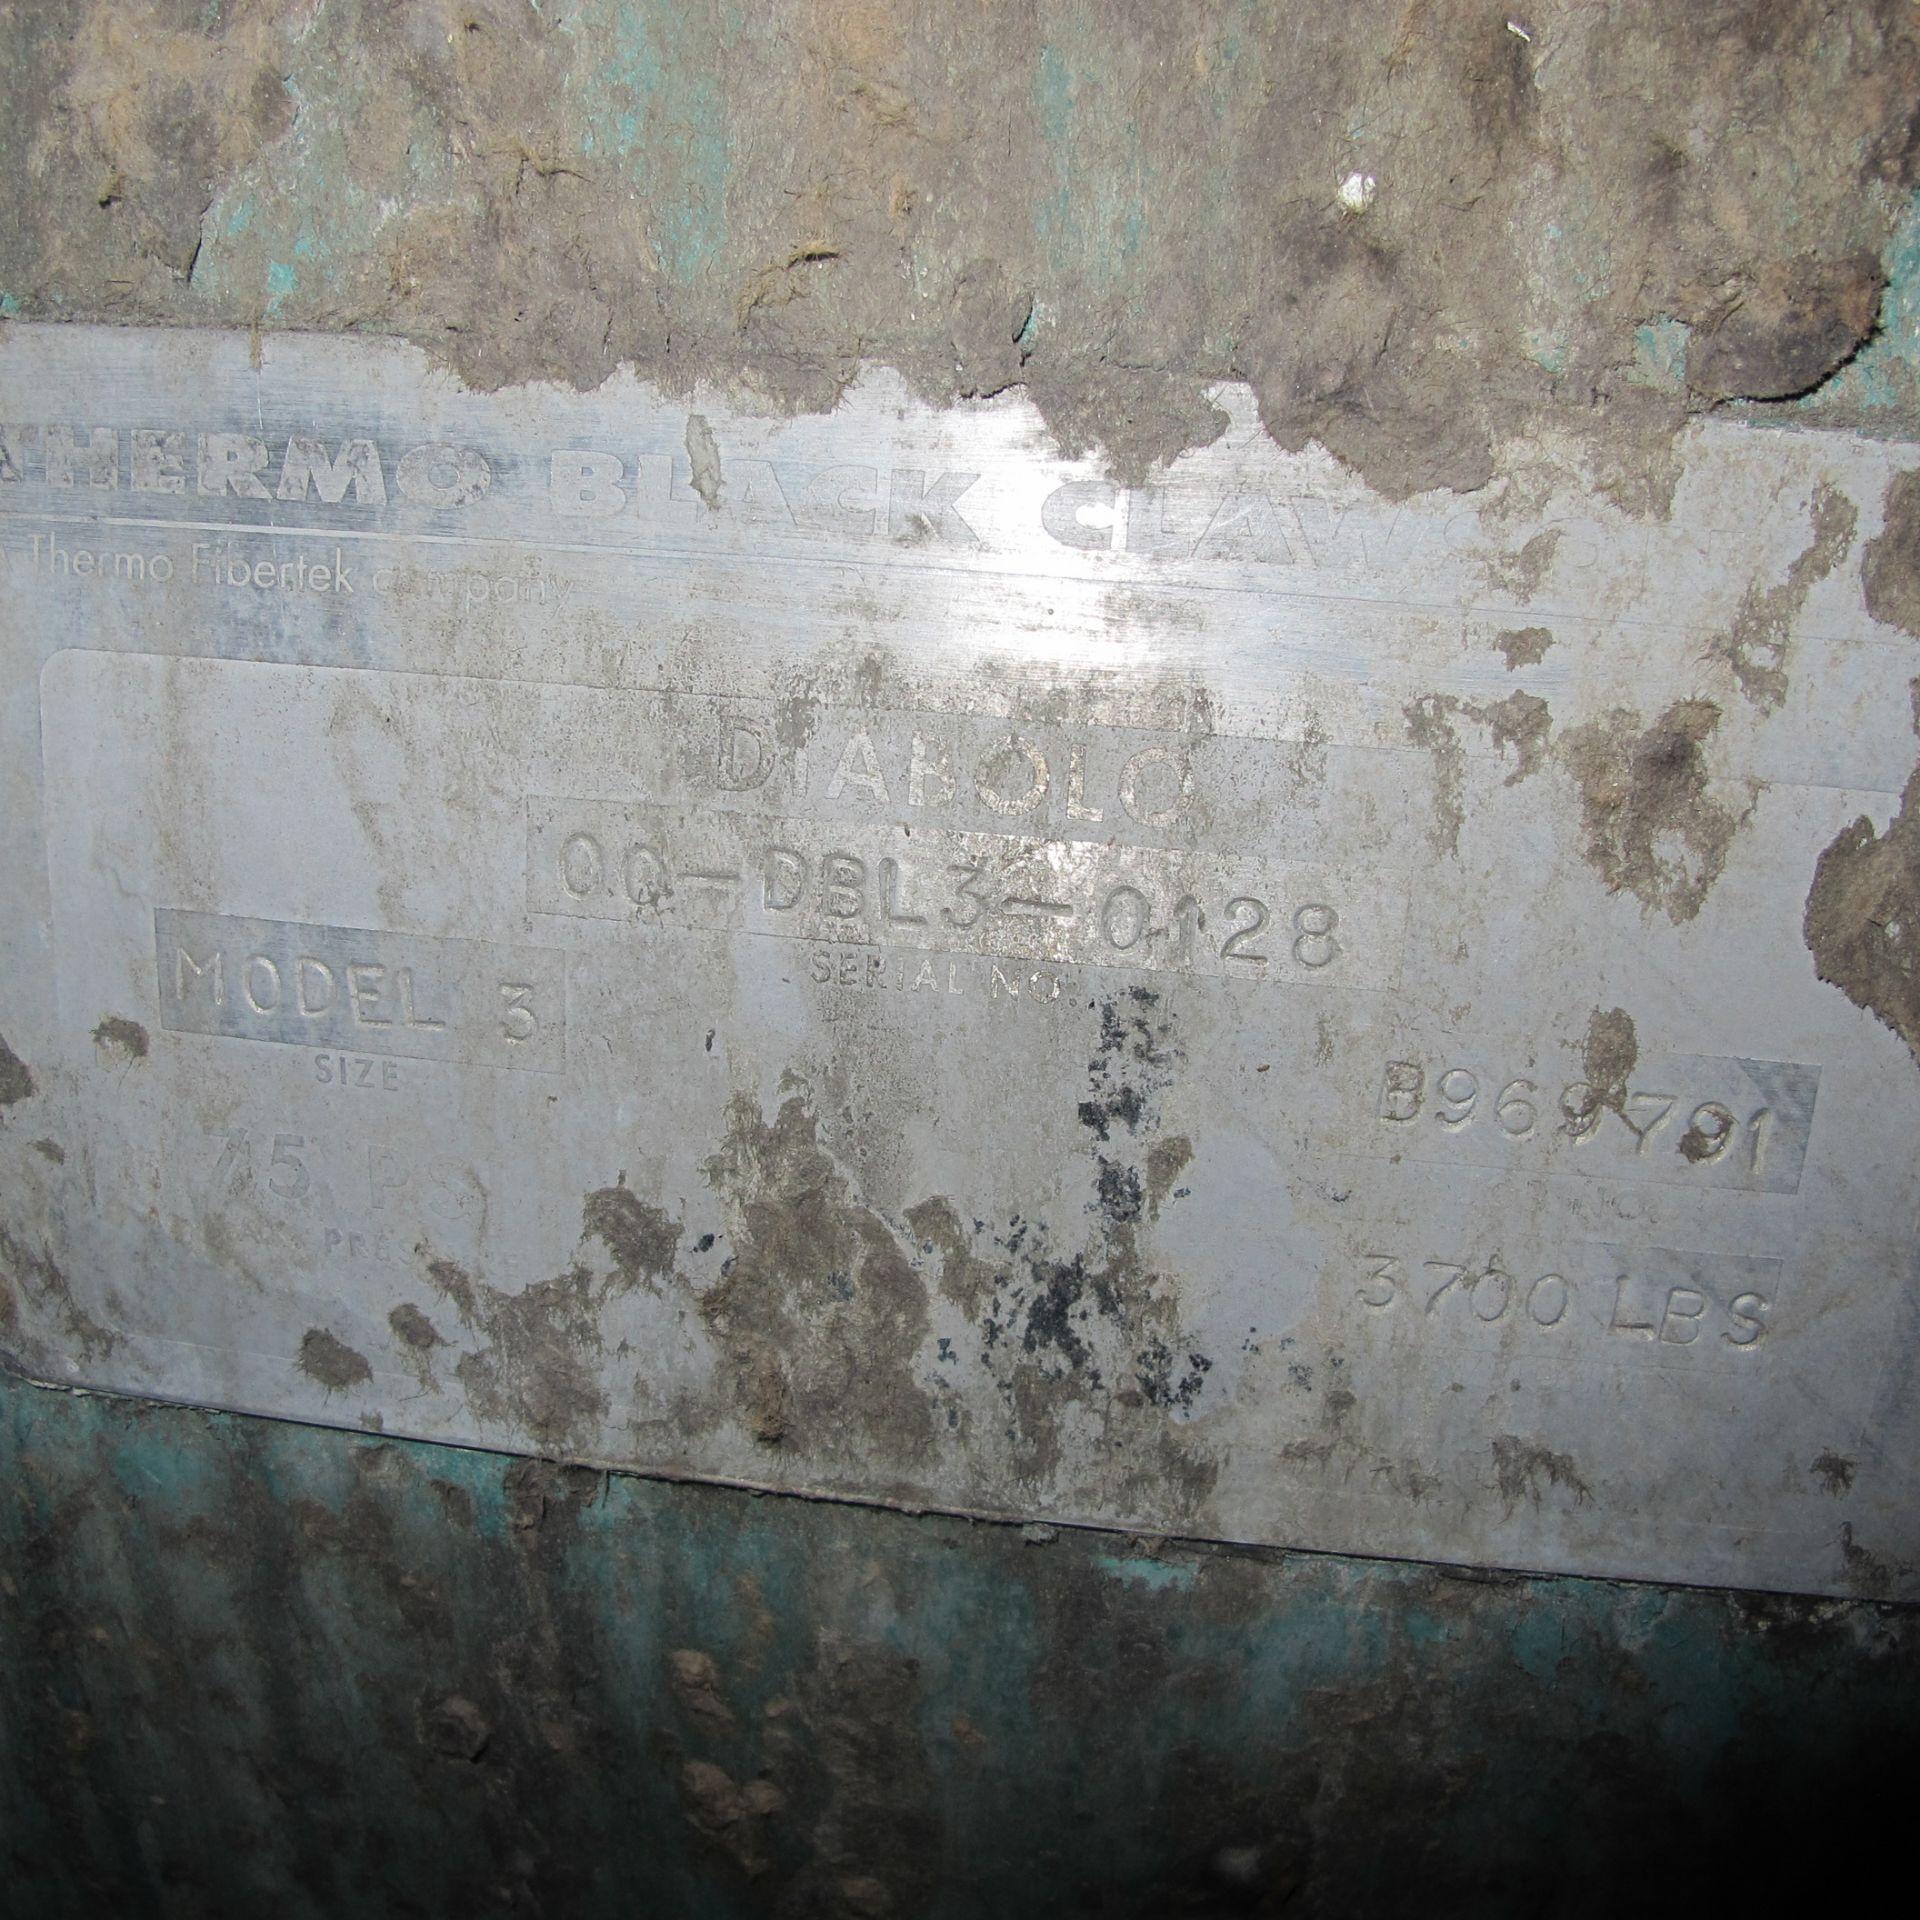 Lot 105 - BLACK CLAWSON DIABLO MODEL 3 SCREEN/DETRASHING, 486 RPM, S/N SN00-DBL3-0128, STAINLESS STEEL